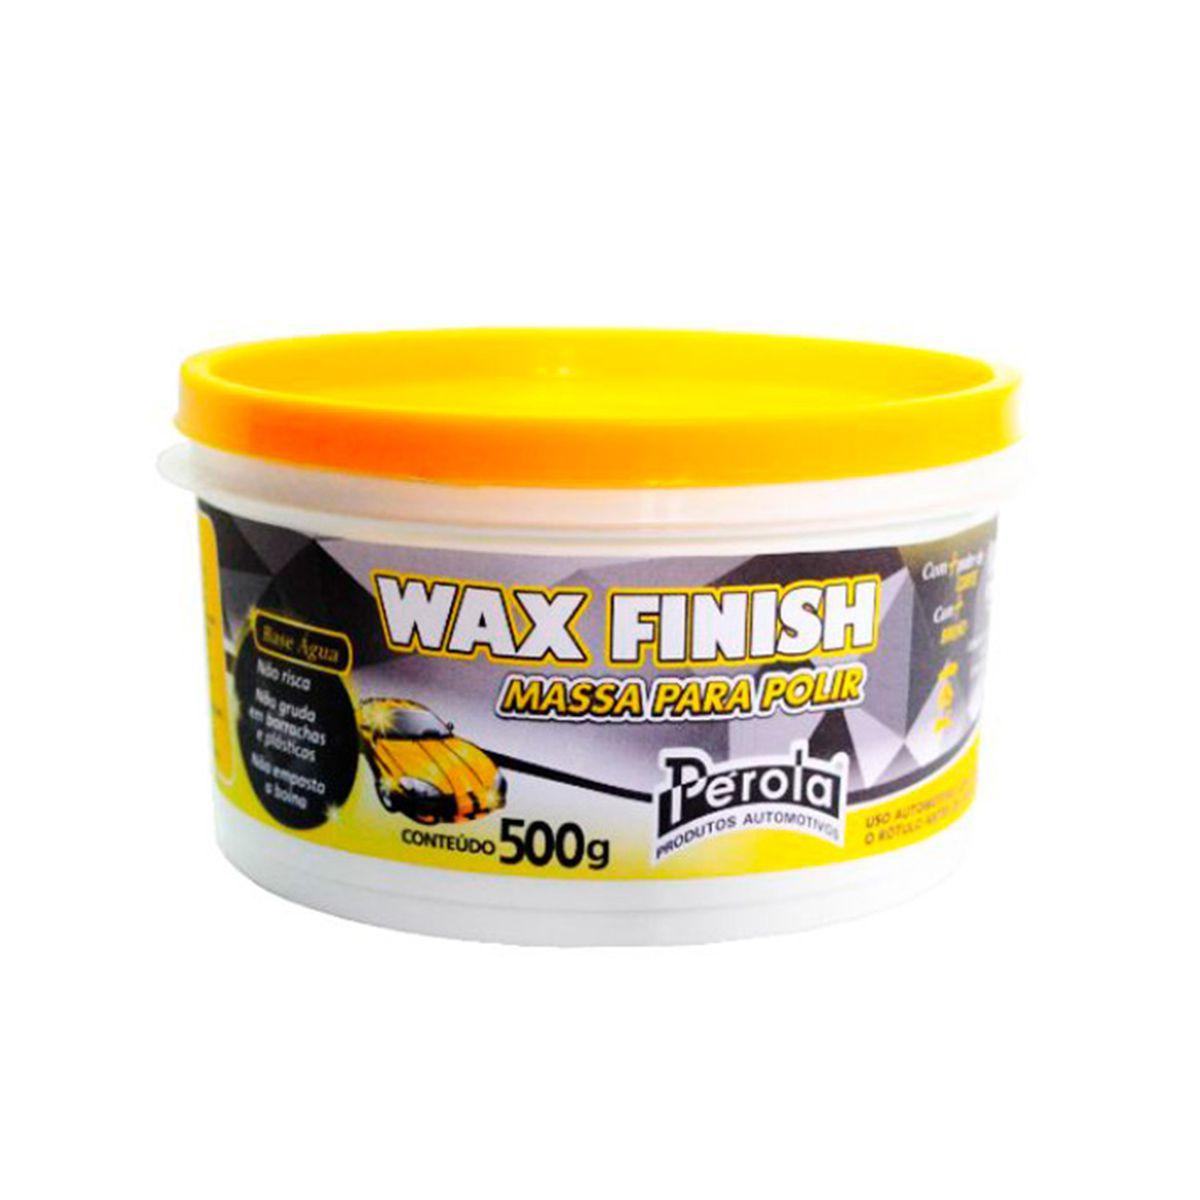 Massa para Polir Wax Finish 500g Perola